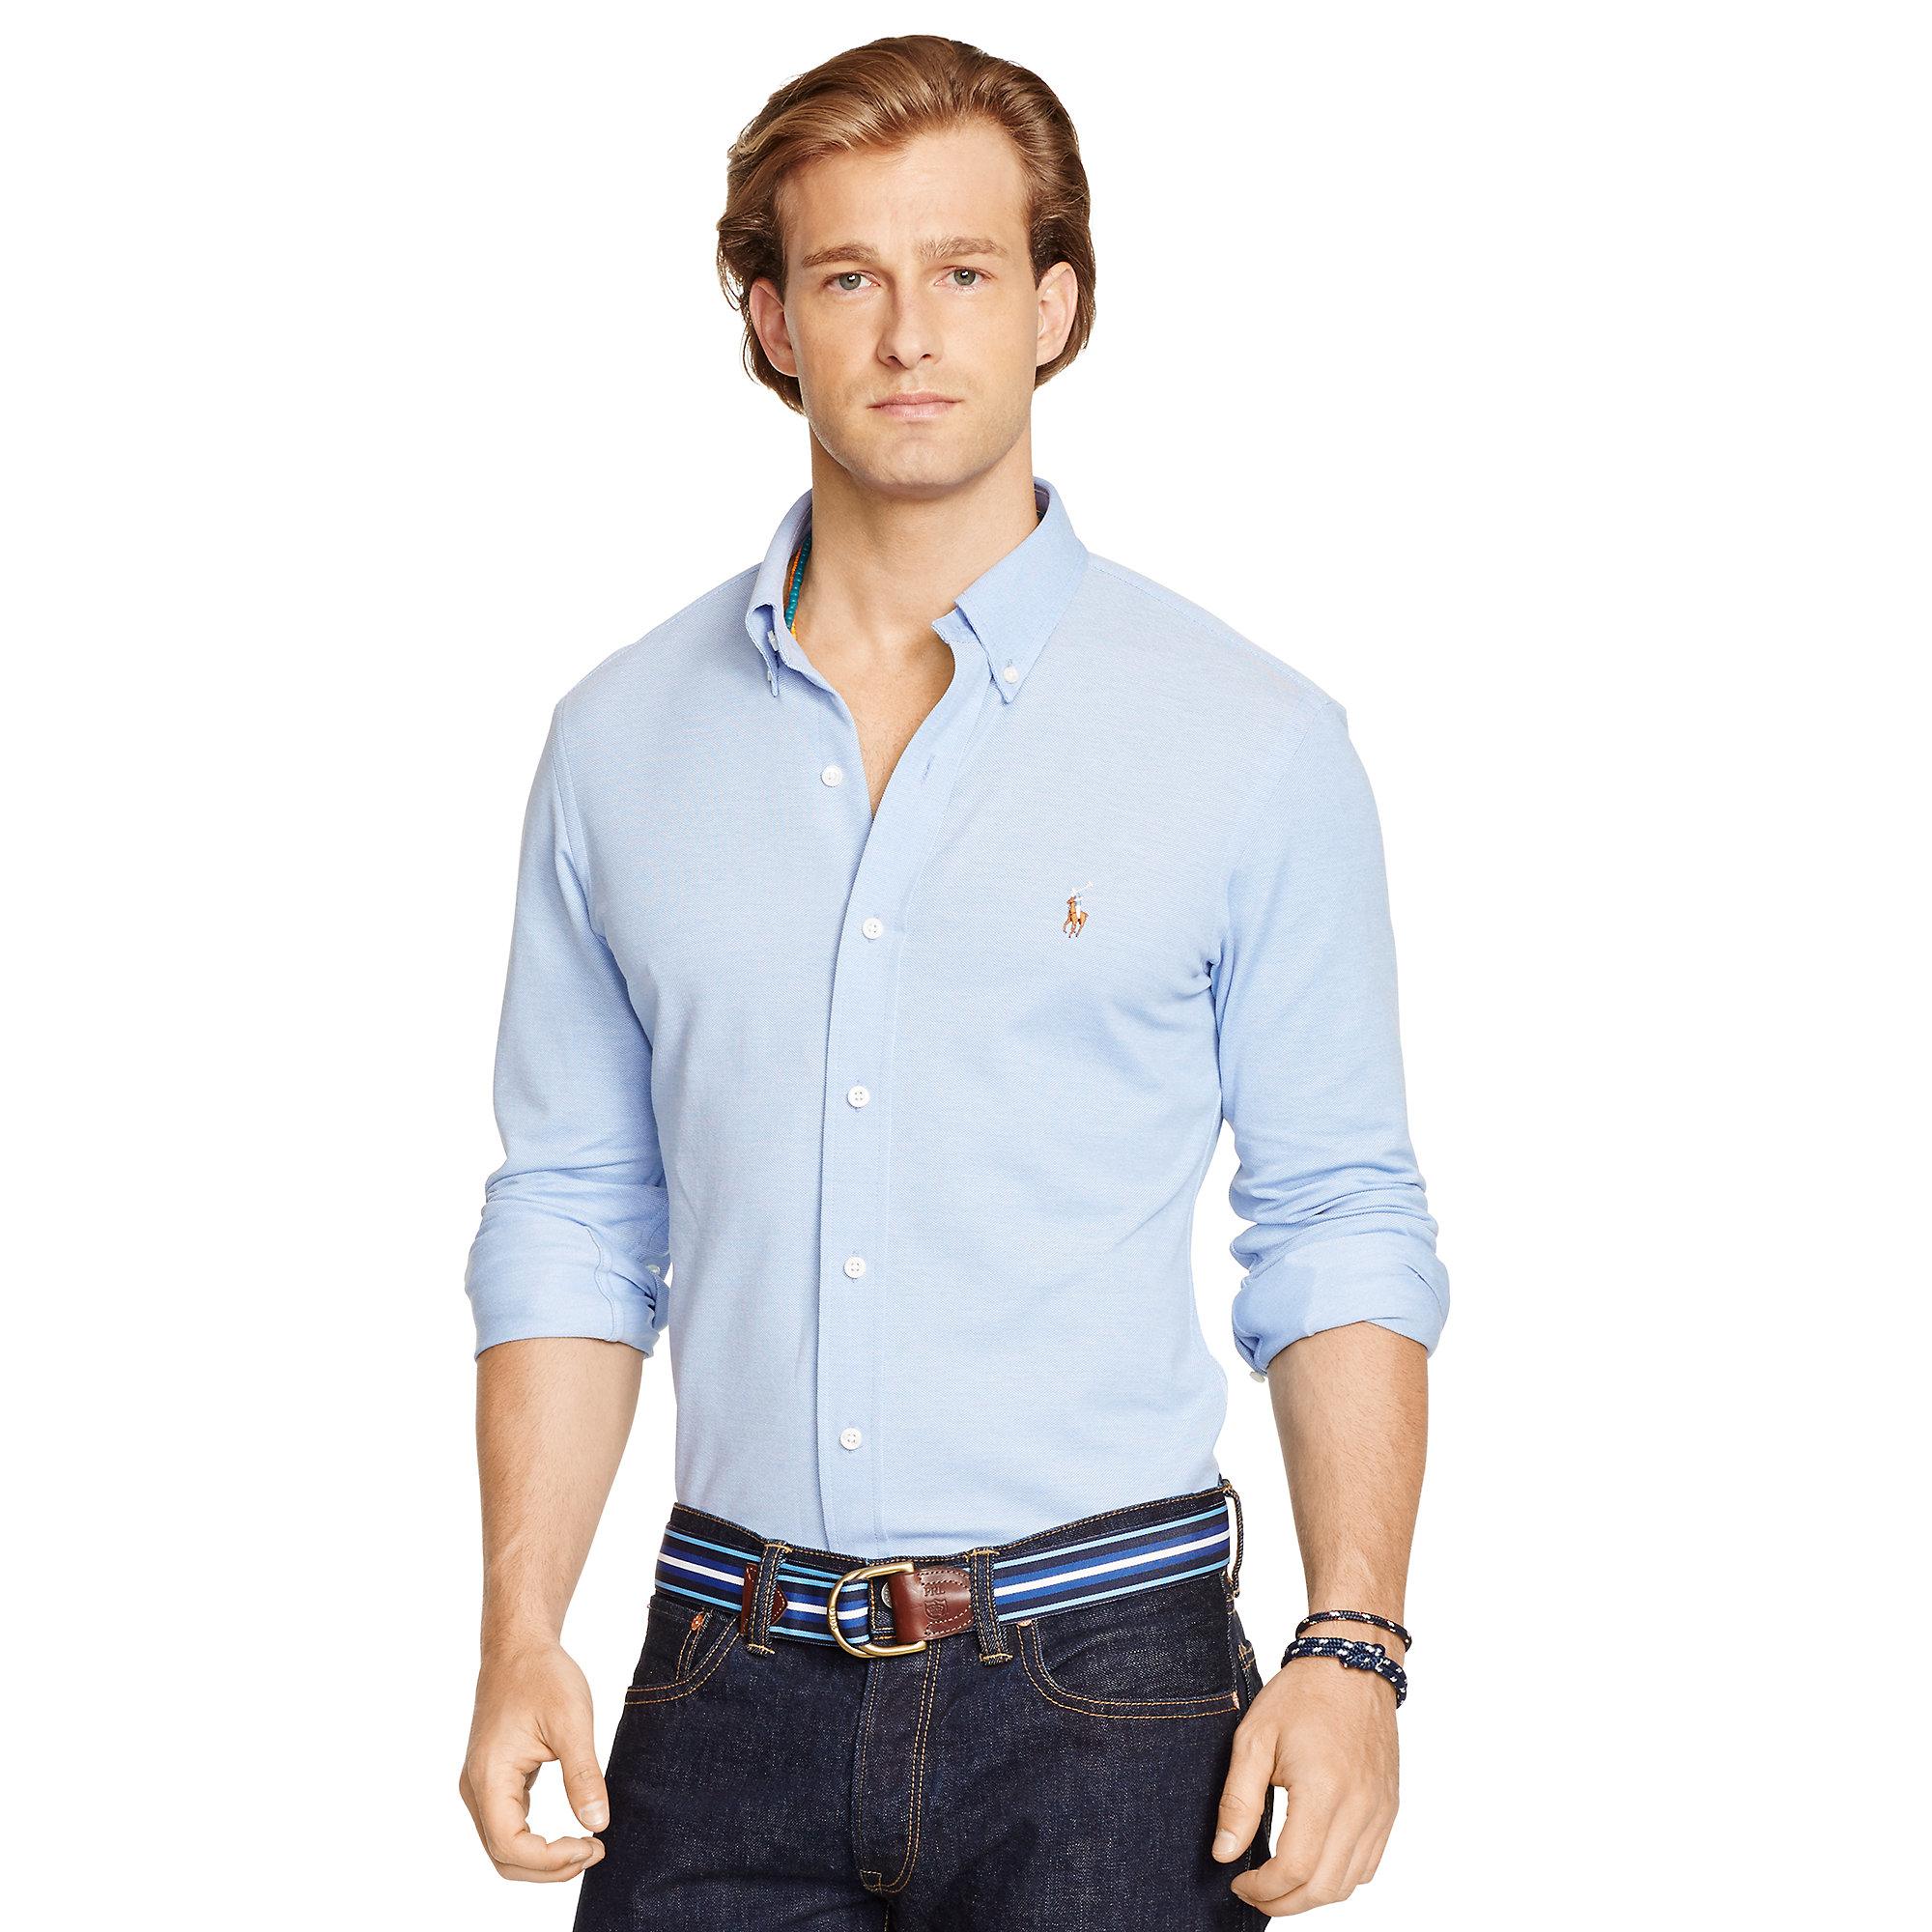 Polo Ralph Lauren Knit Oxford Shirt In Blue For Men Lyst